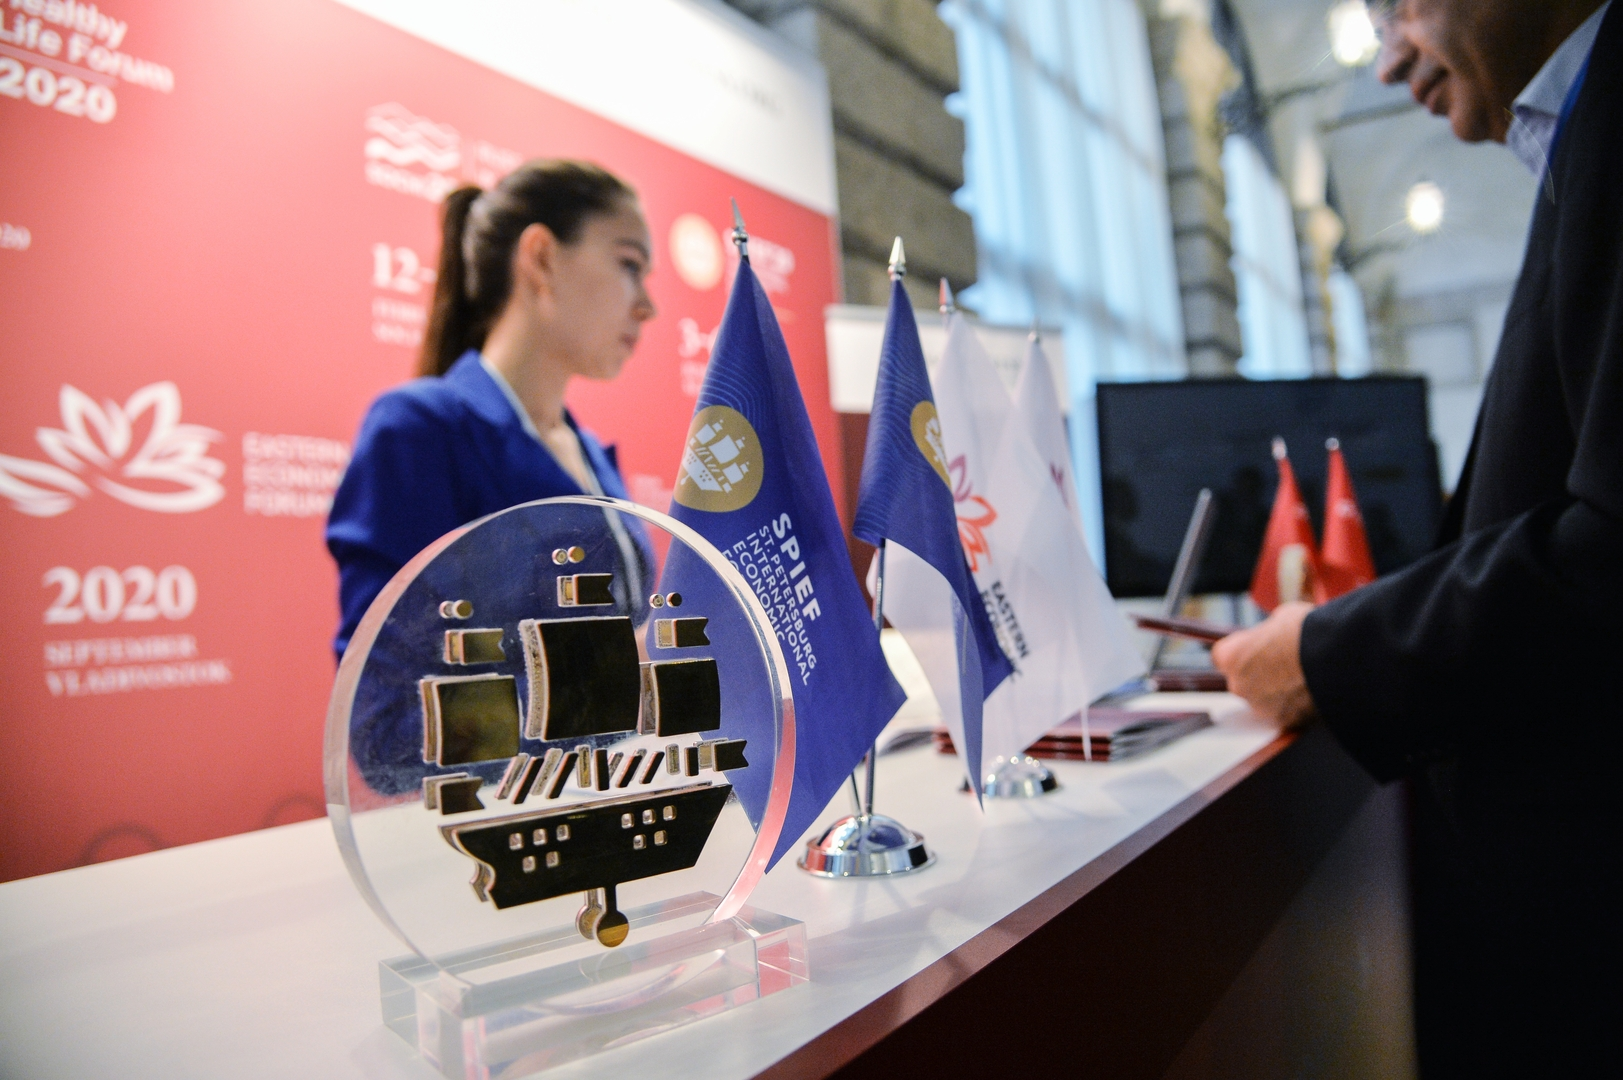 Determine the date of the Petersburg International Economic Forum